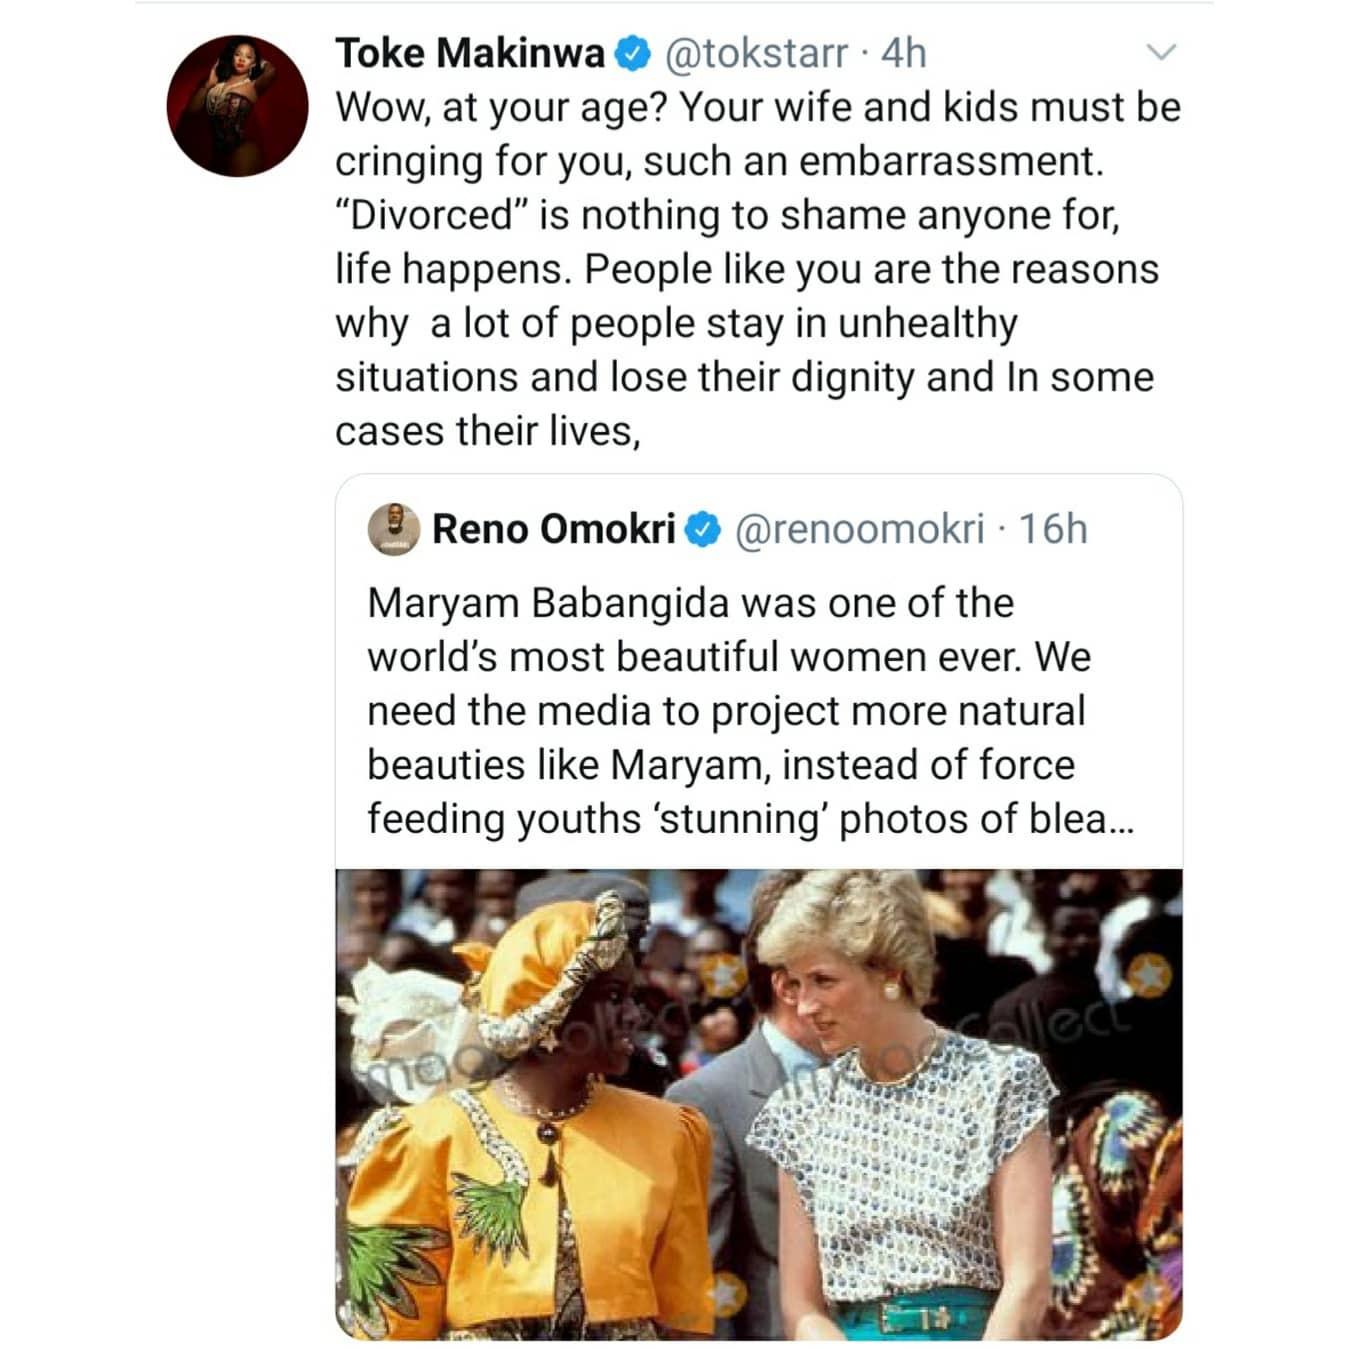 Makinwa's tweet